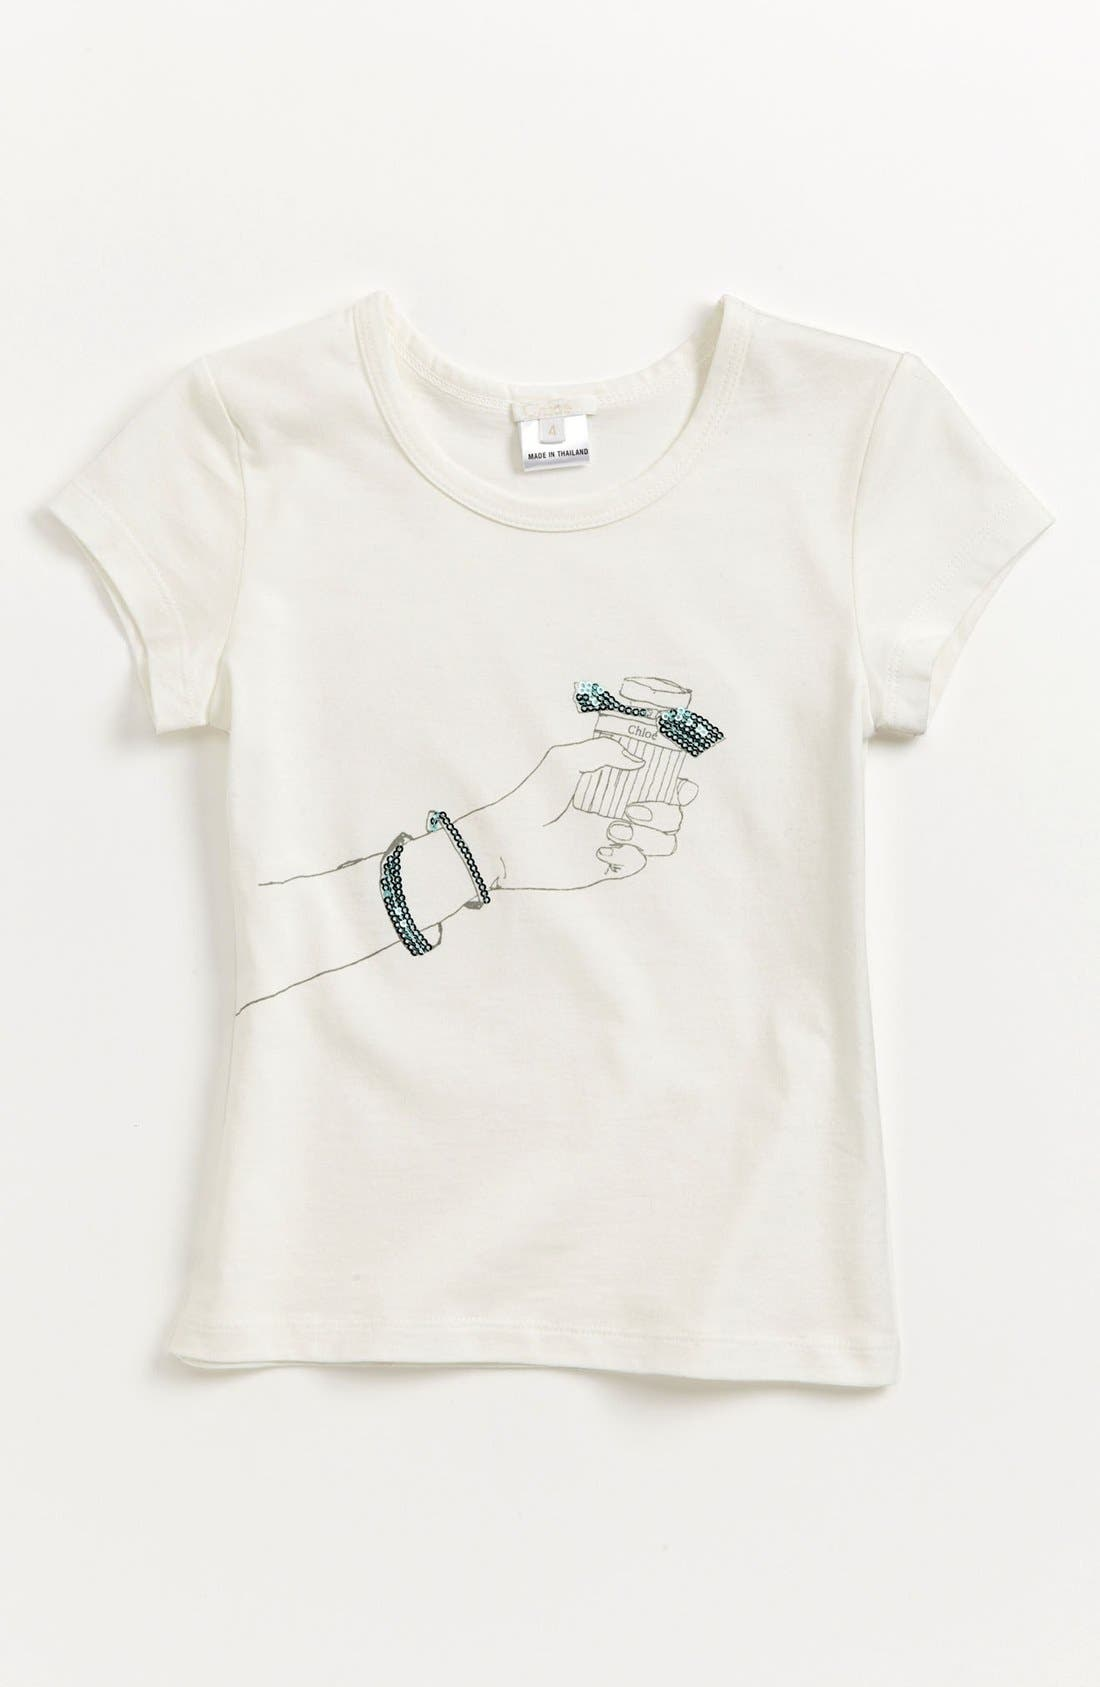 Main Image - Chloé Print Tee (Toddler, Little Girls & Big Girls)